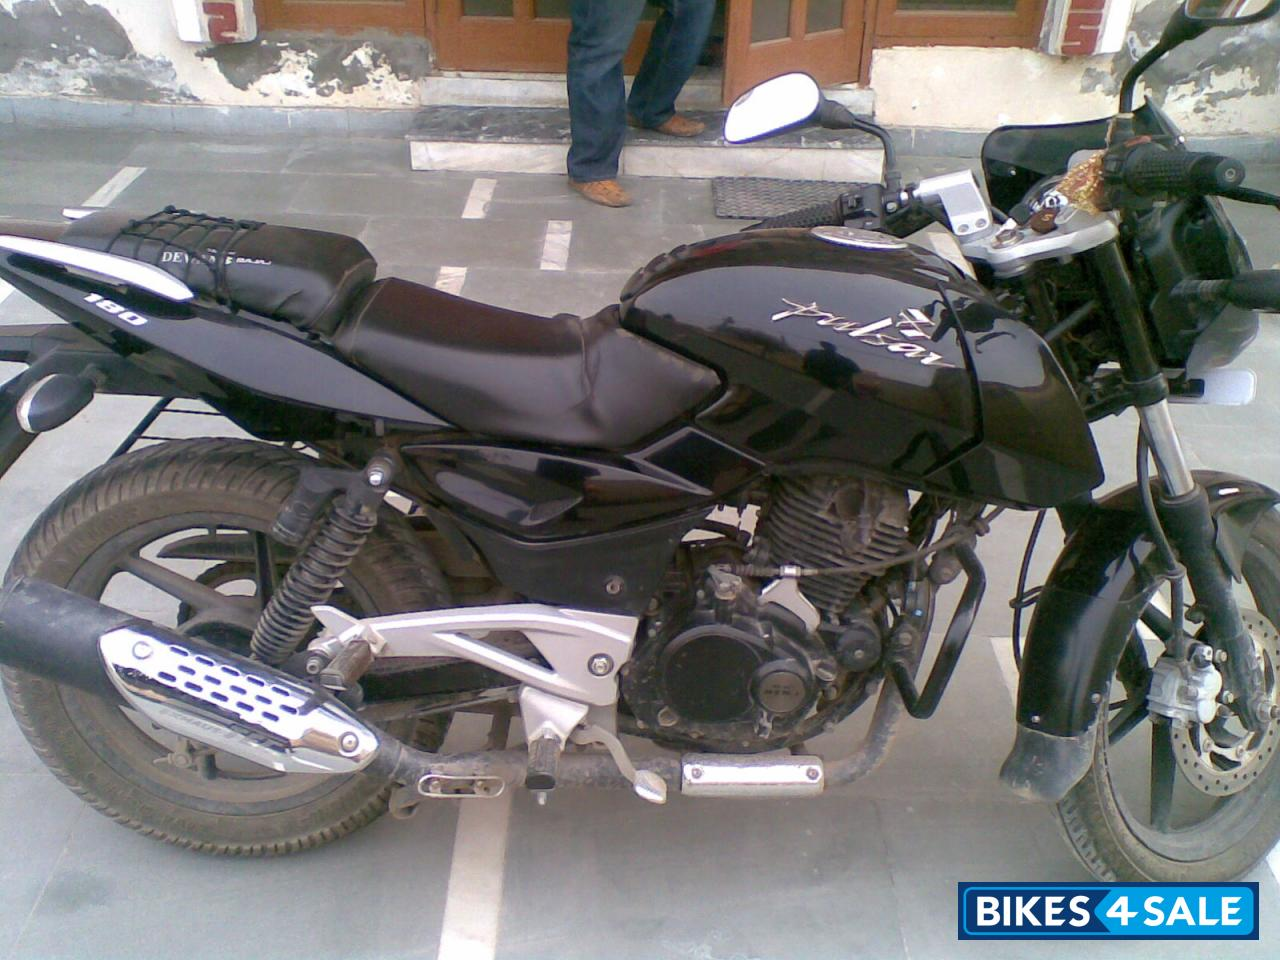 how to get duplicate registration certificate of bike in delhi